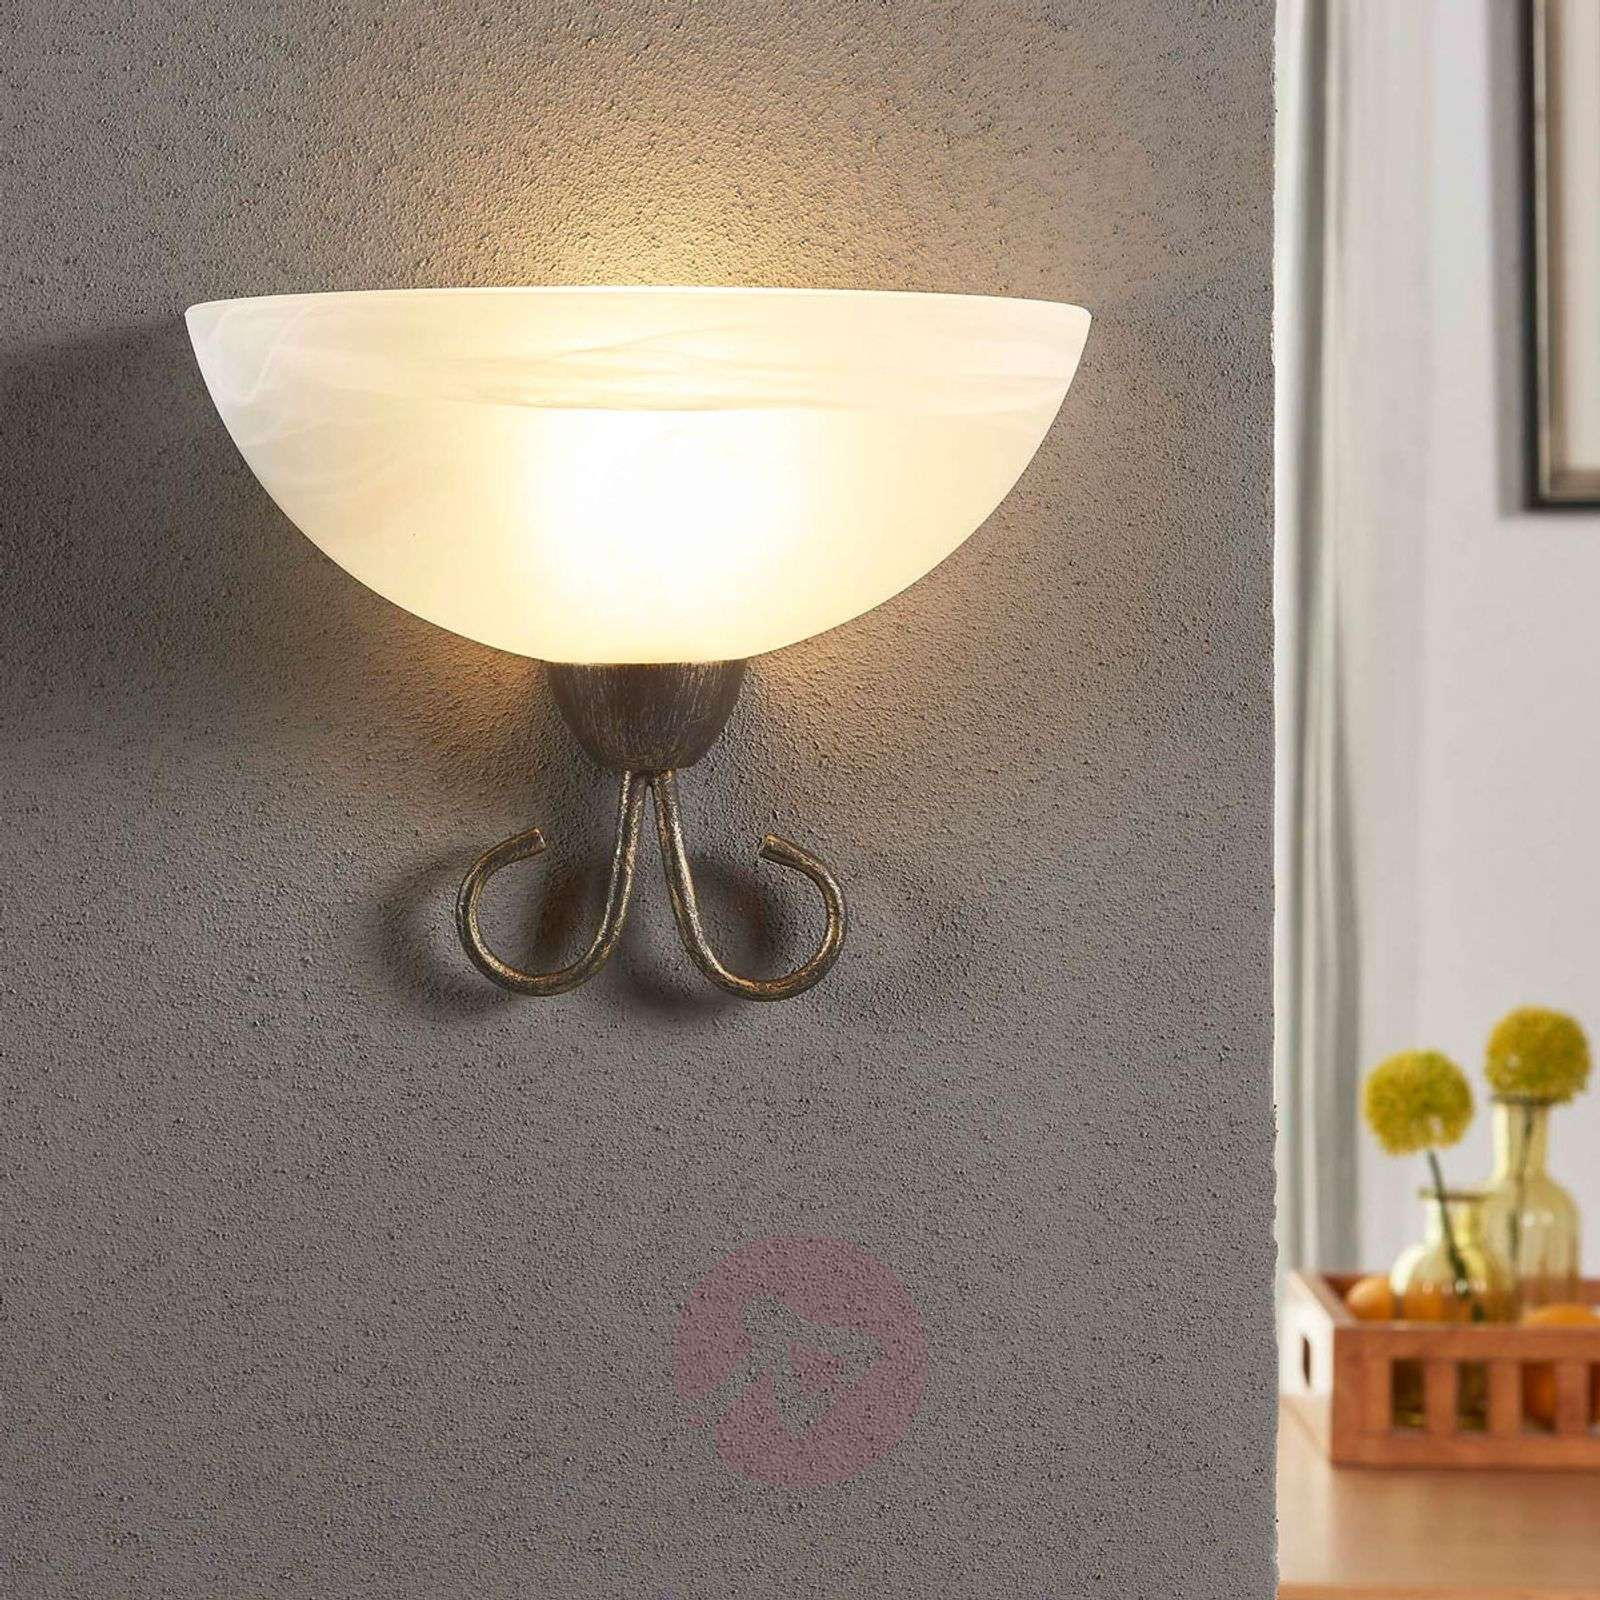 Attractive wall lamp Castila-9620867-01